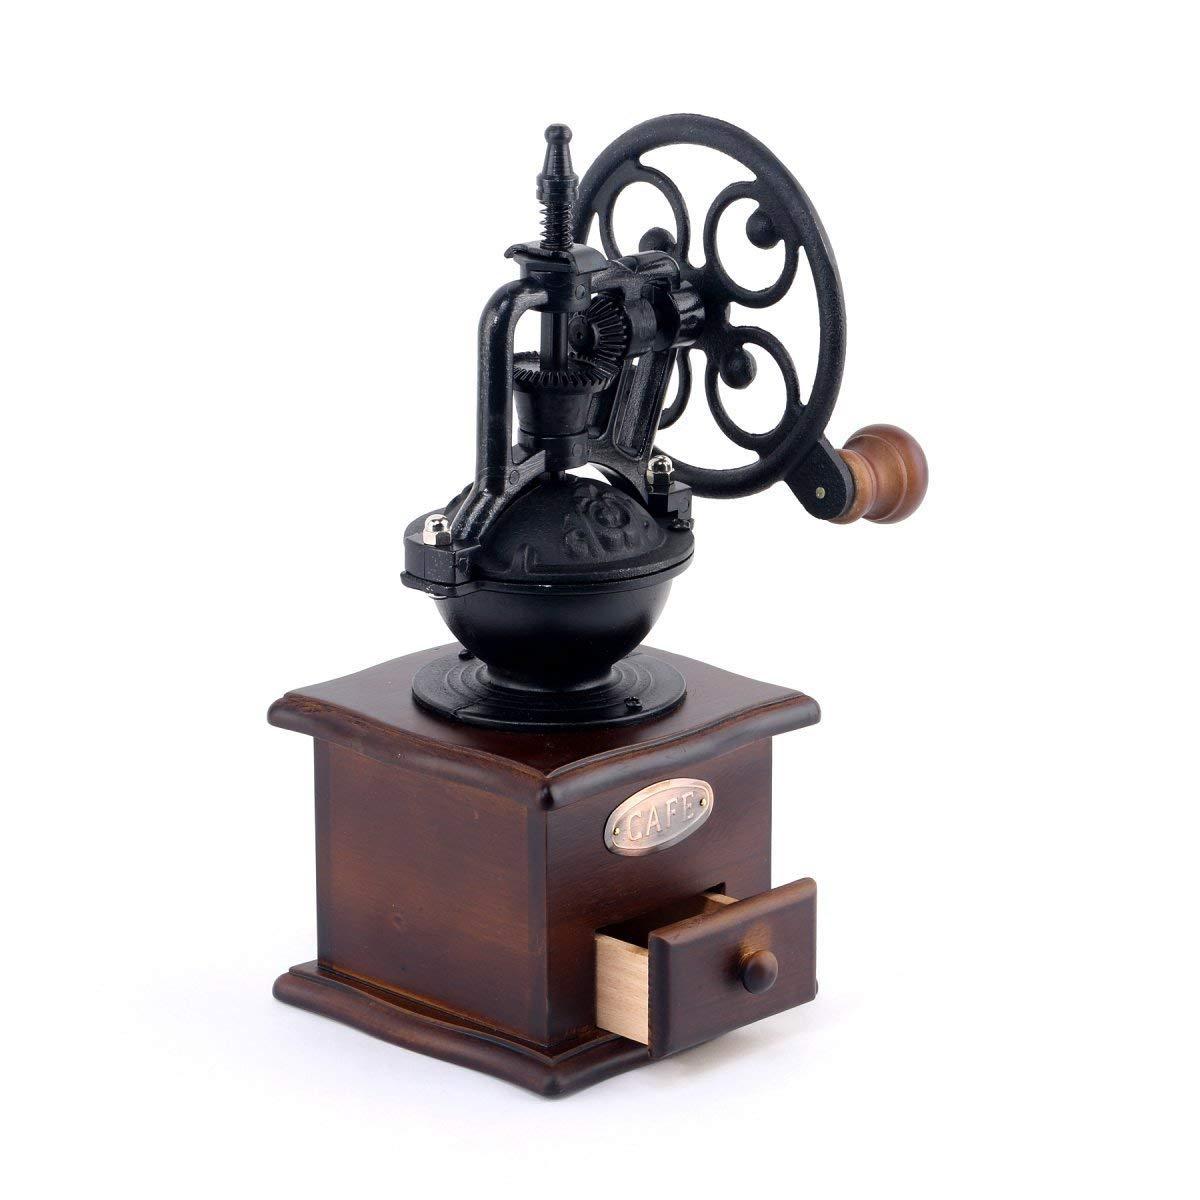 Foruchoice vintage style coffee grinder spice hand grinding machine